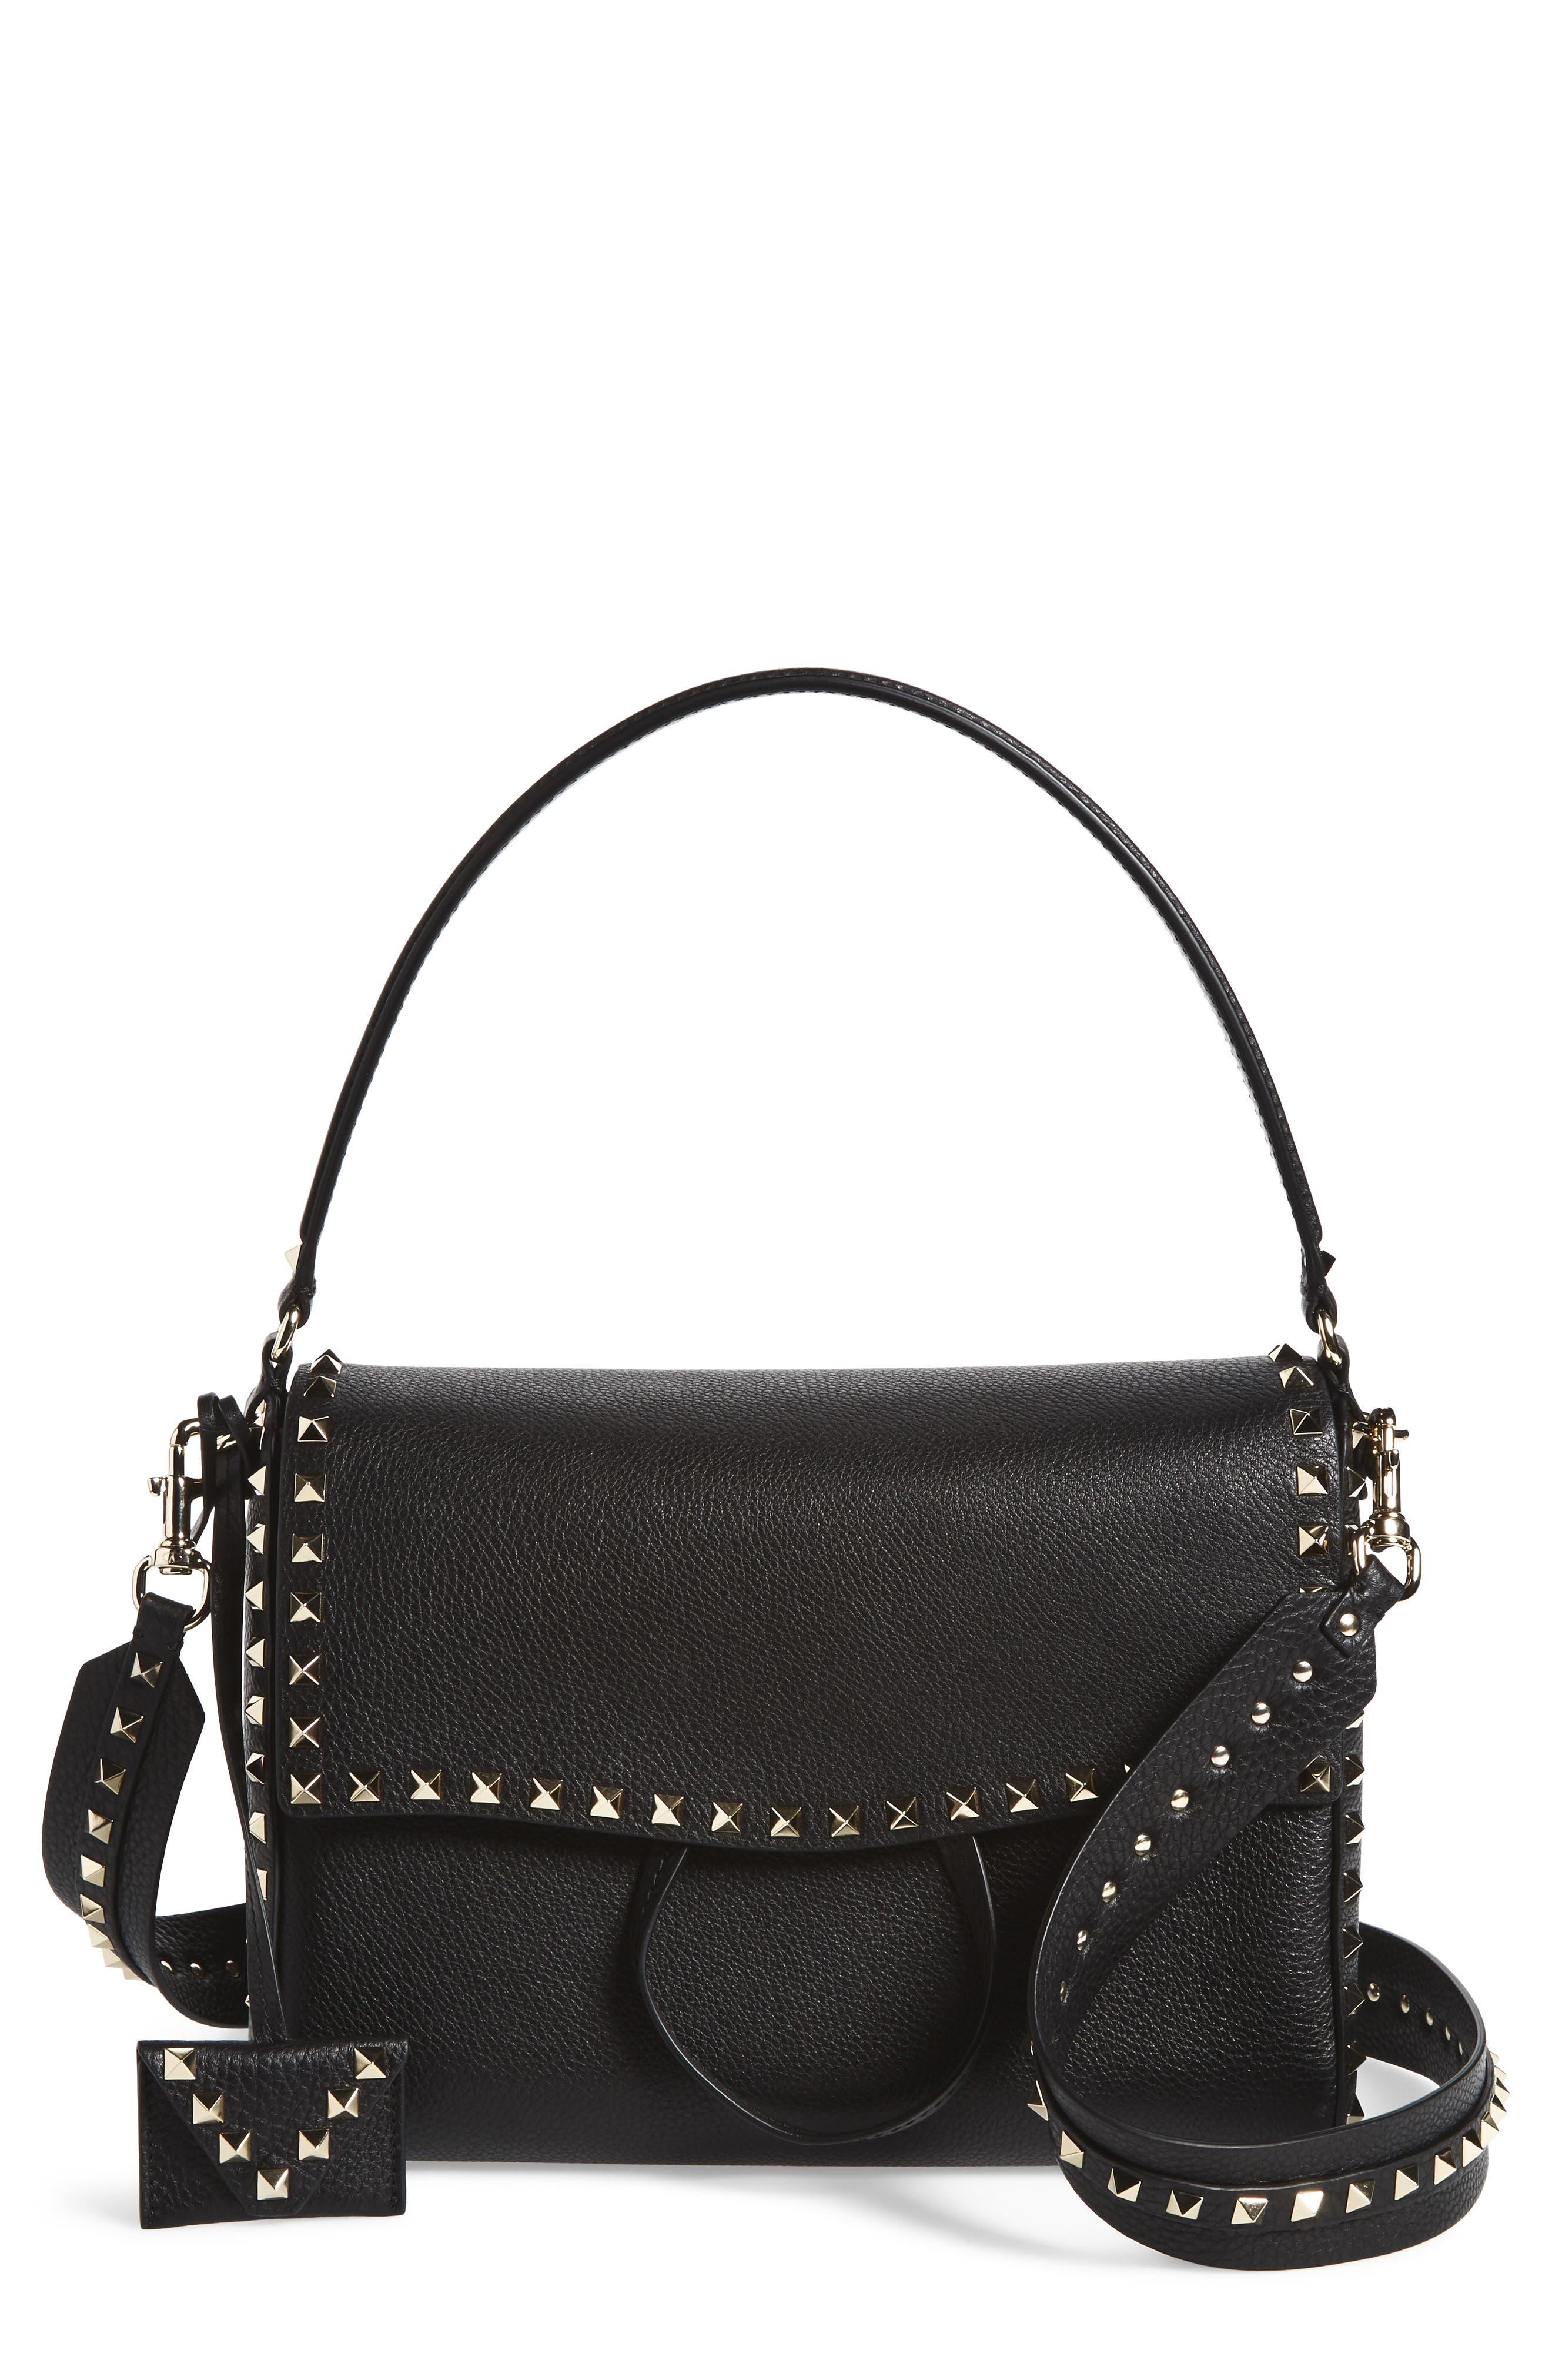 Medium Rockstud Leather Shoulder Bag,                             Main thumbnail 1, color,                             001